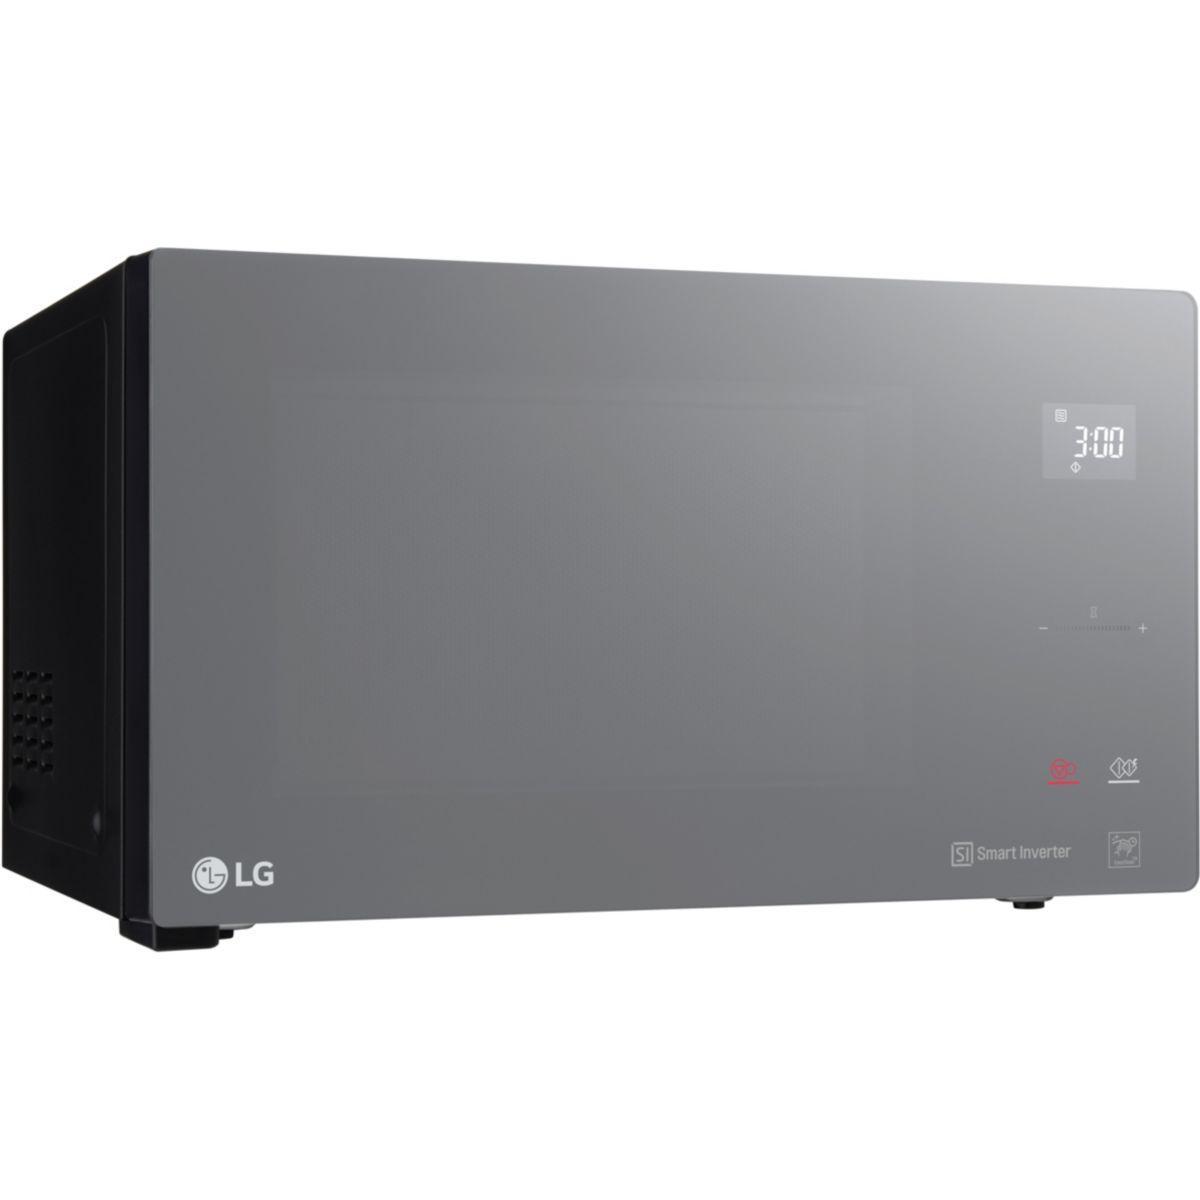 Micro-onde grill lg ex mh7295ddr - livraison offerte : code liv